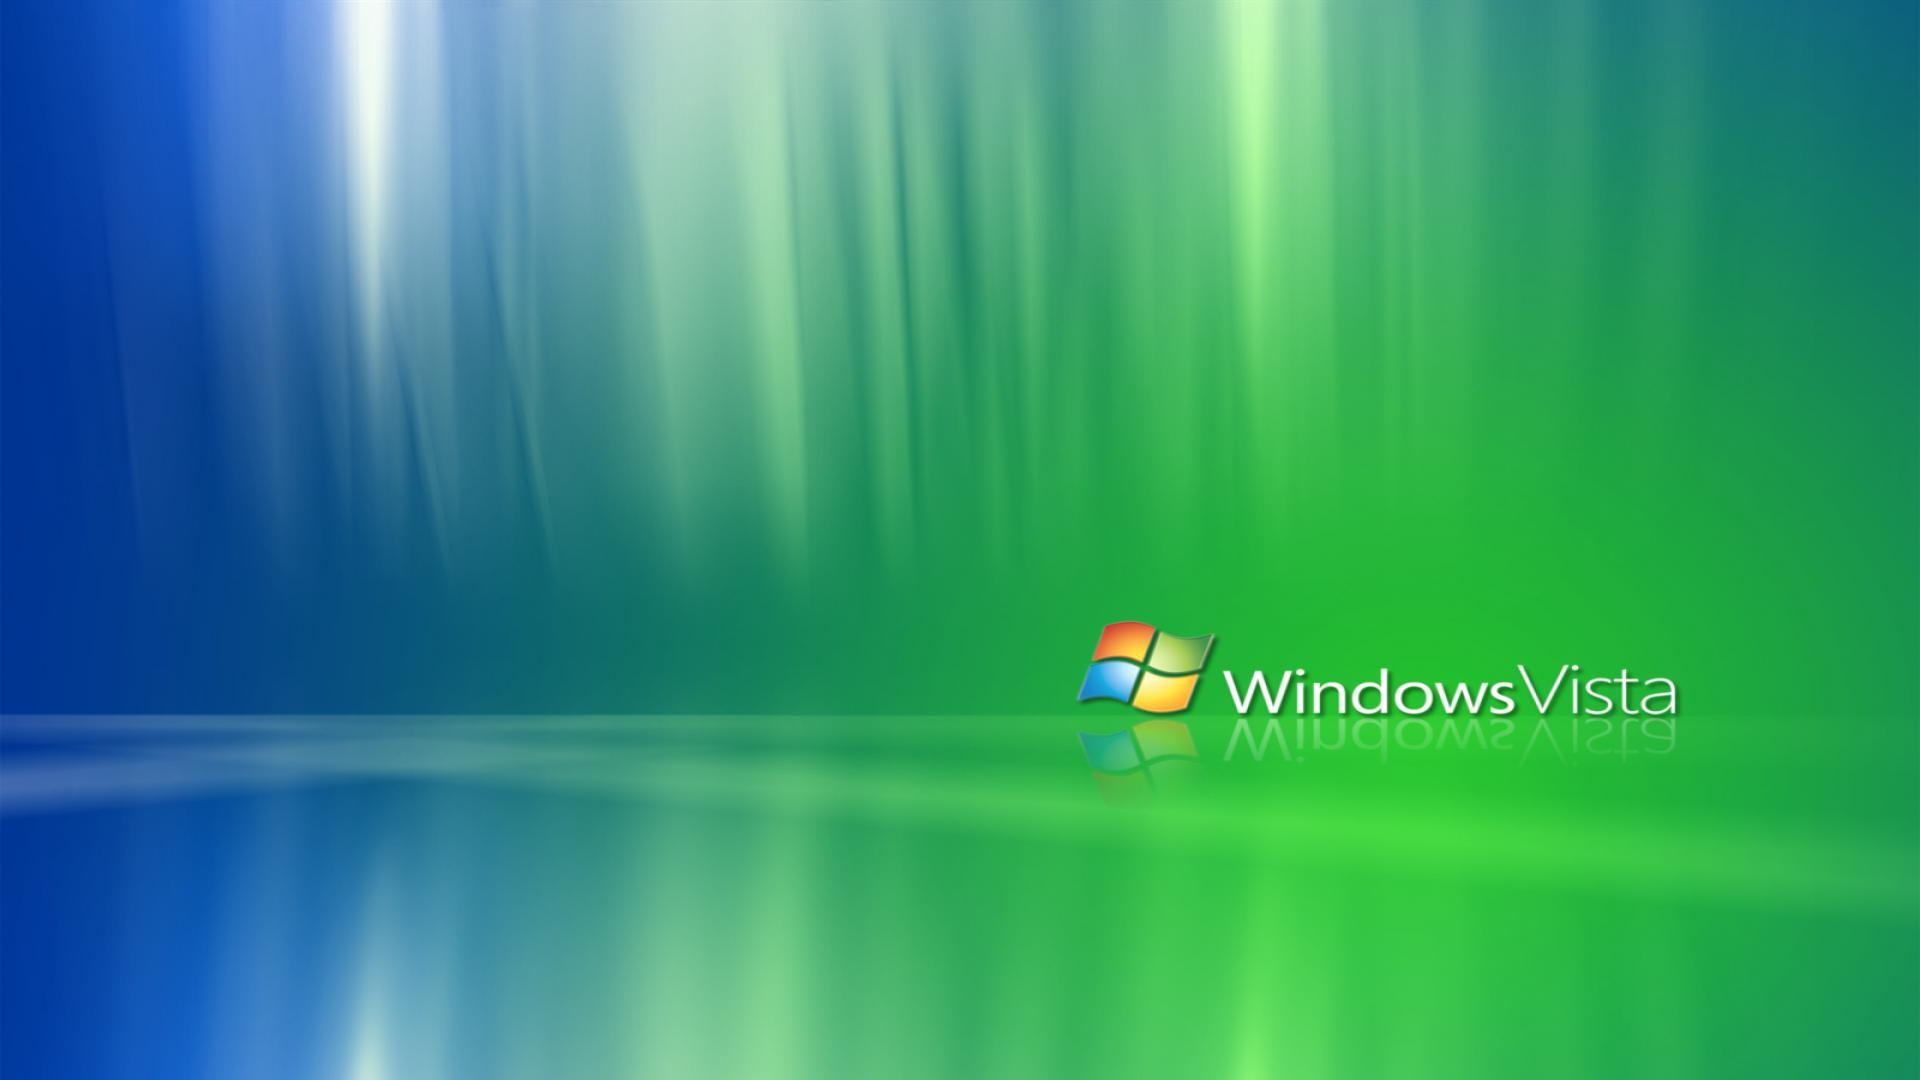 Res: 1920x1080, Windows-Vista-HD-Wallpaper-Galerie-(77-Plus)-PIC-WPW502442